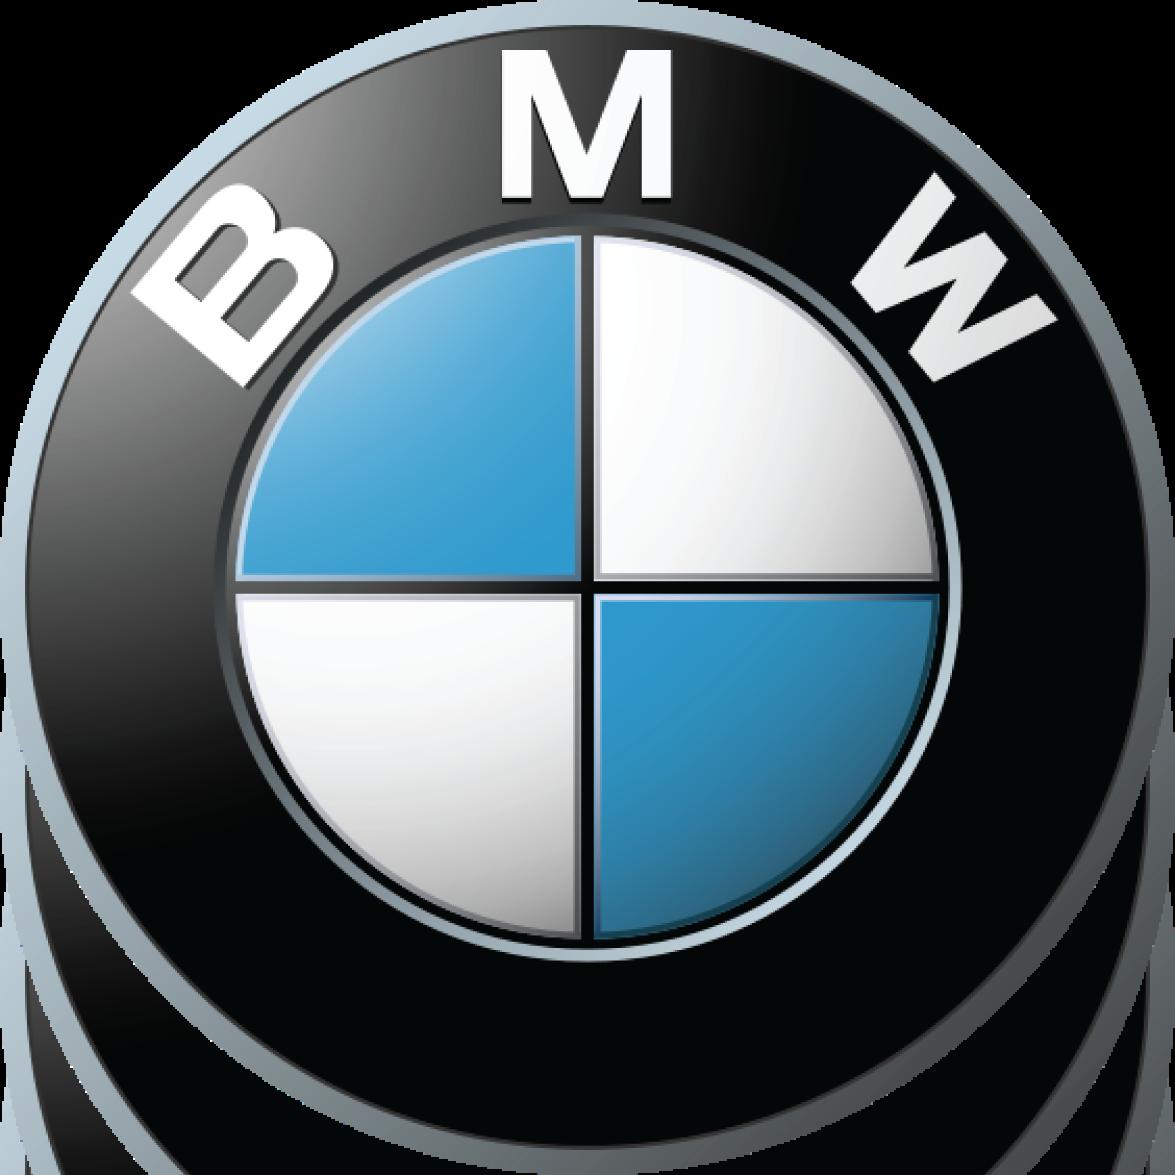 bmw description of the company